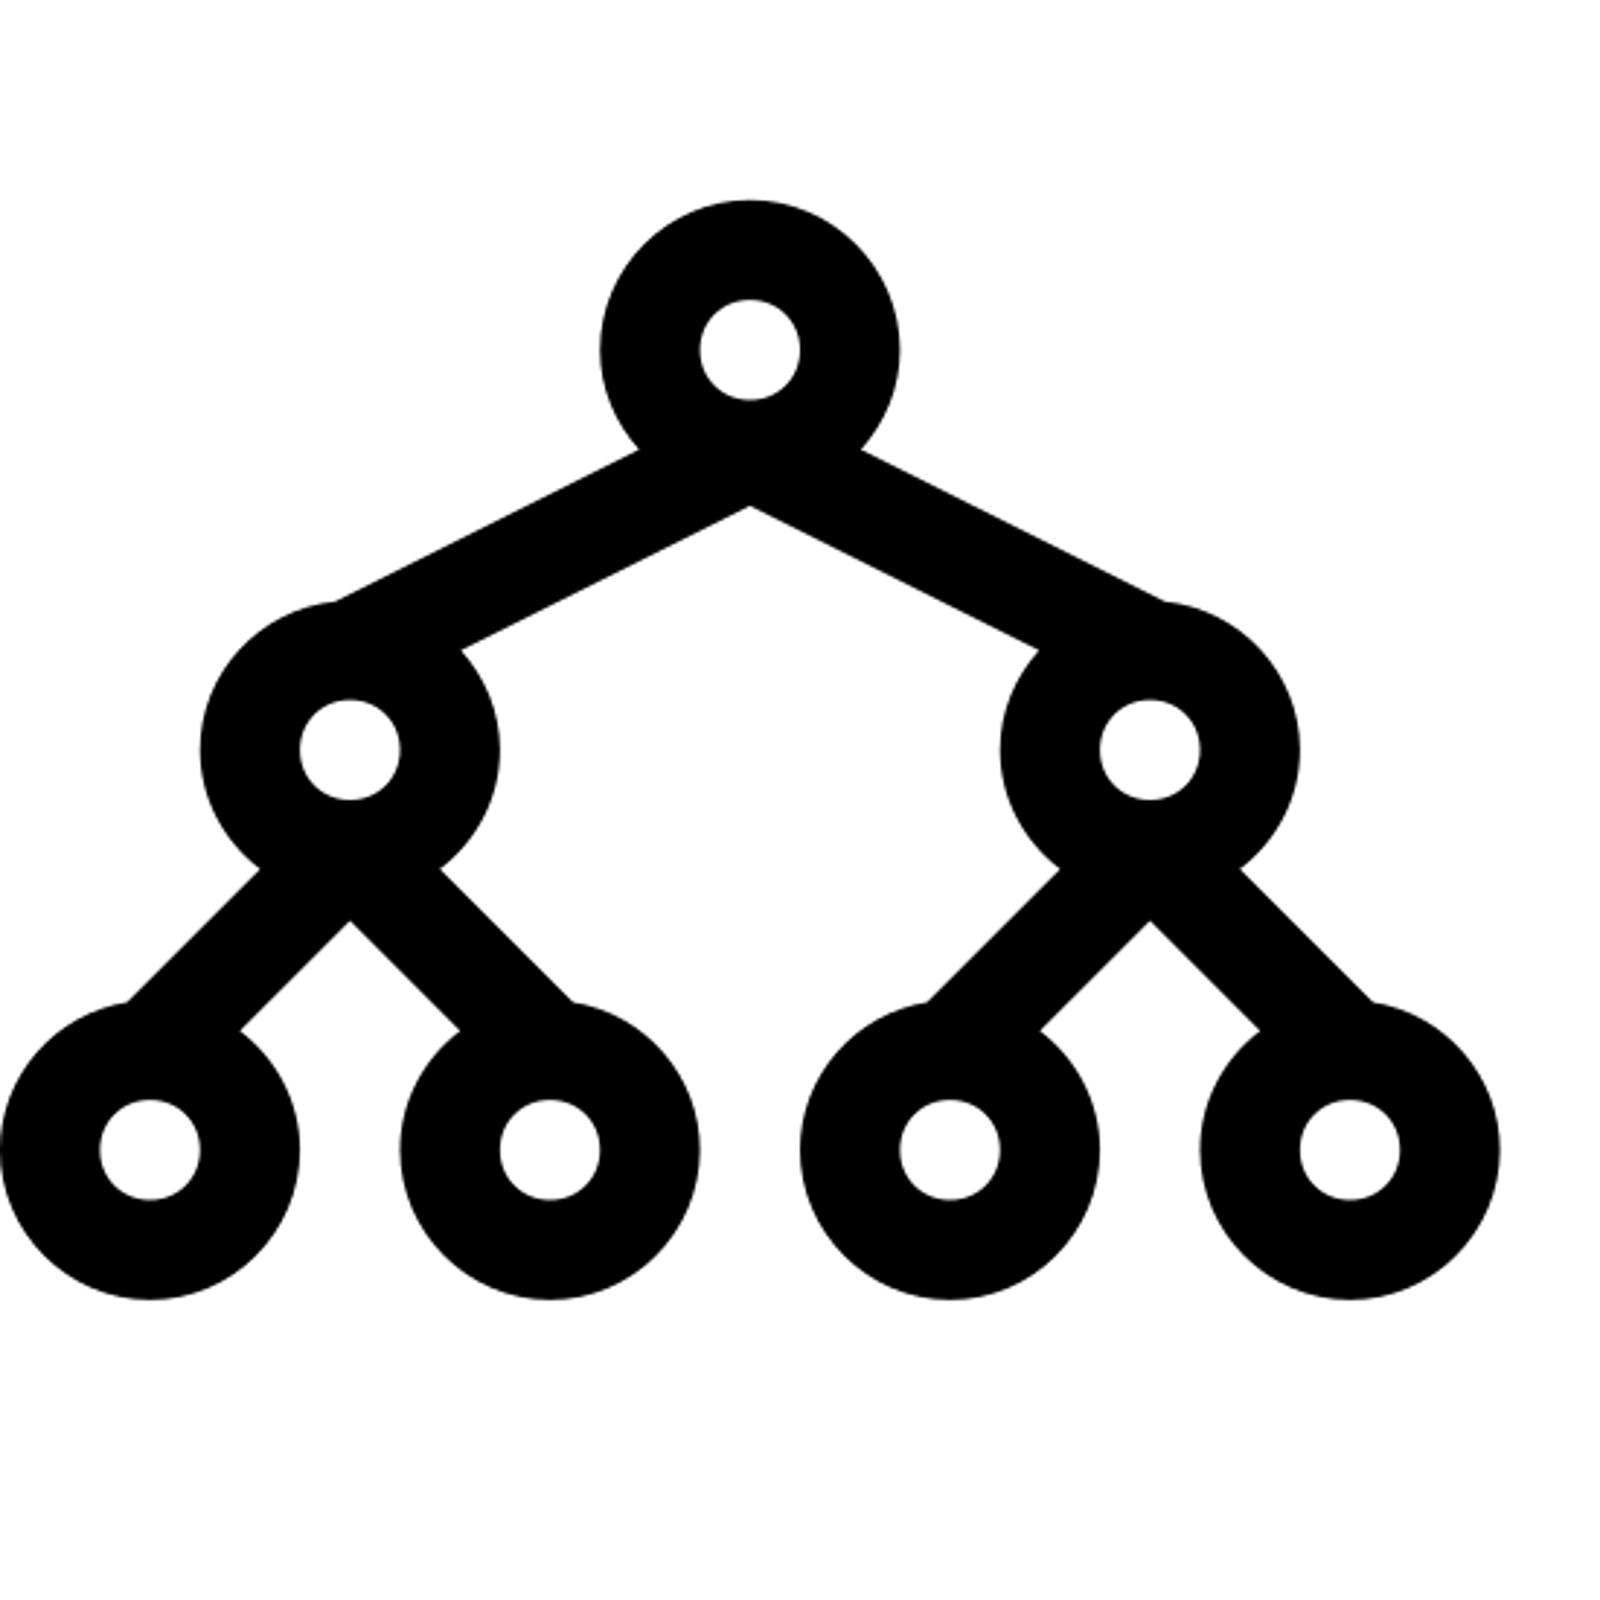 Archiwum icon